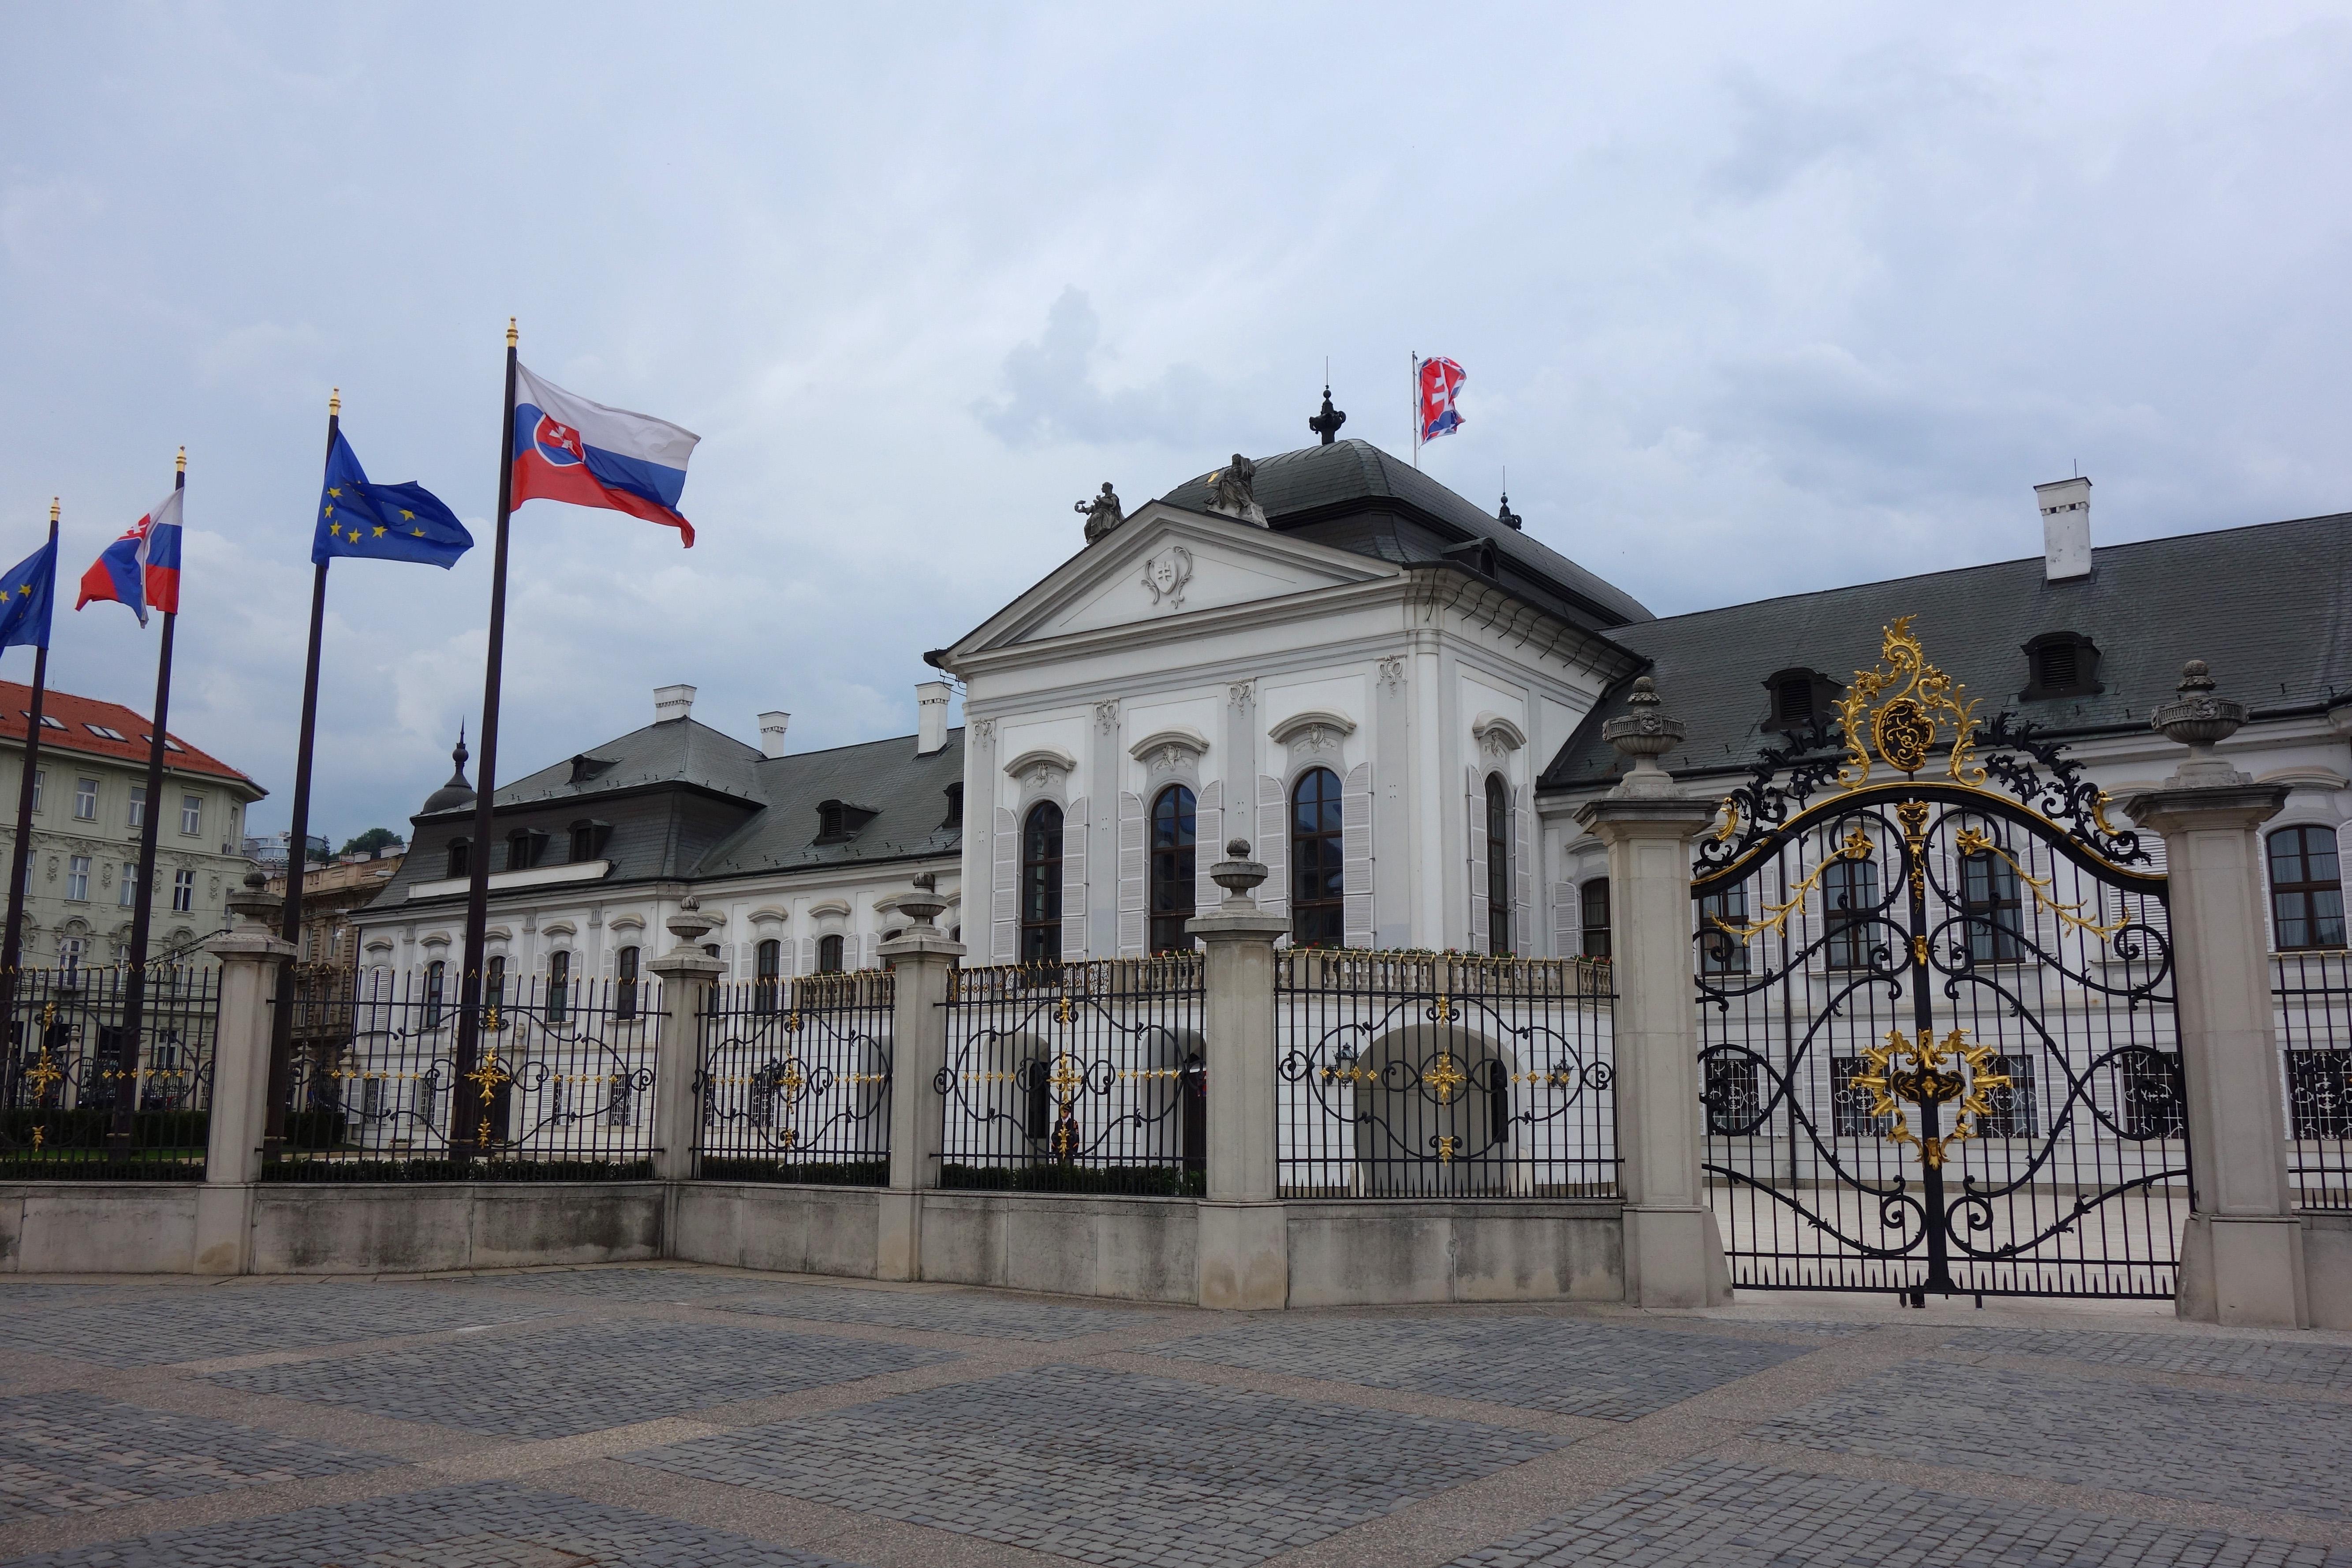 visiter le palais grassalkovitch bratisalava